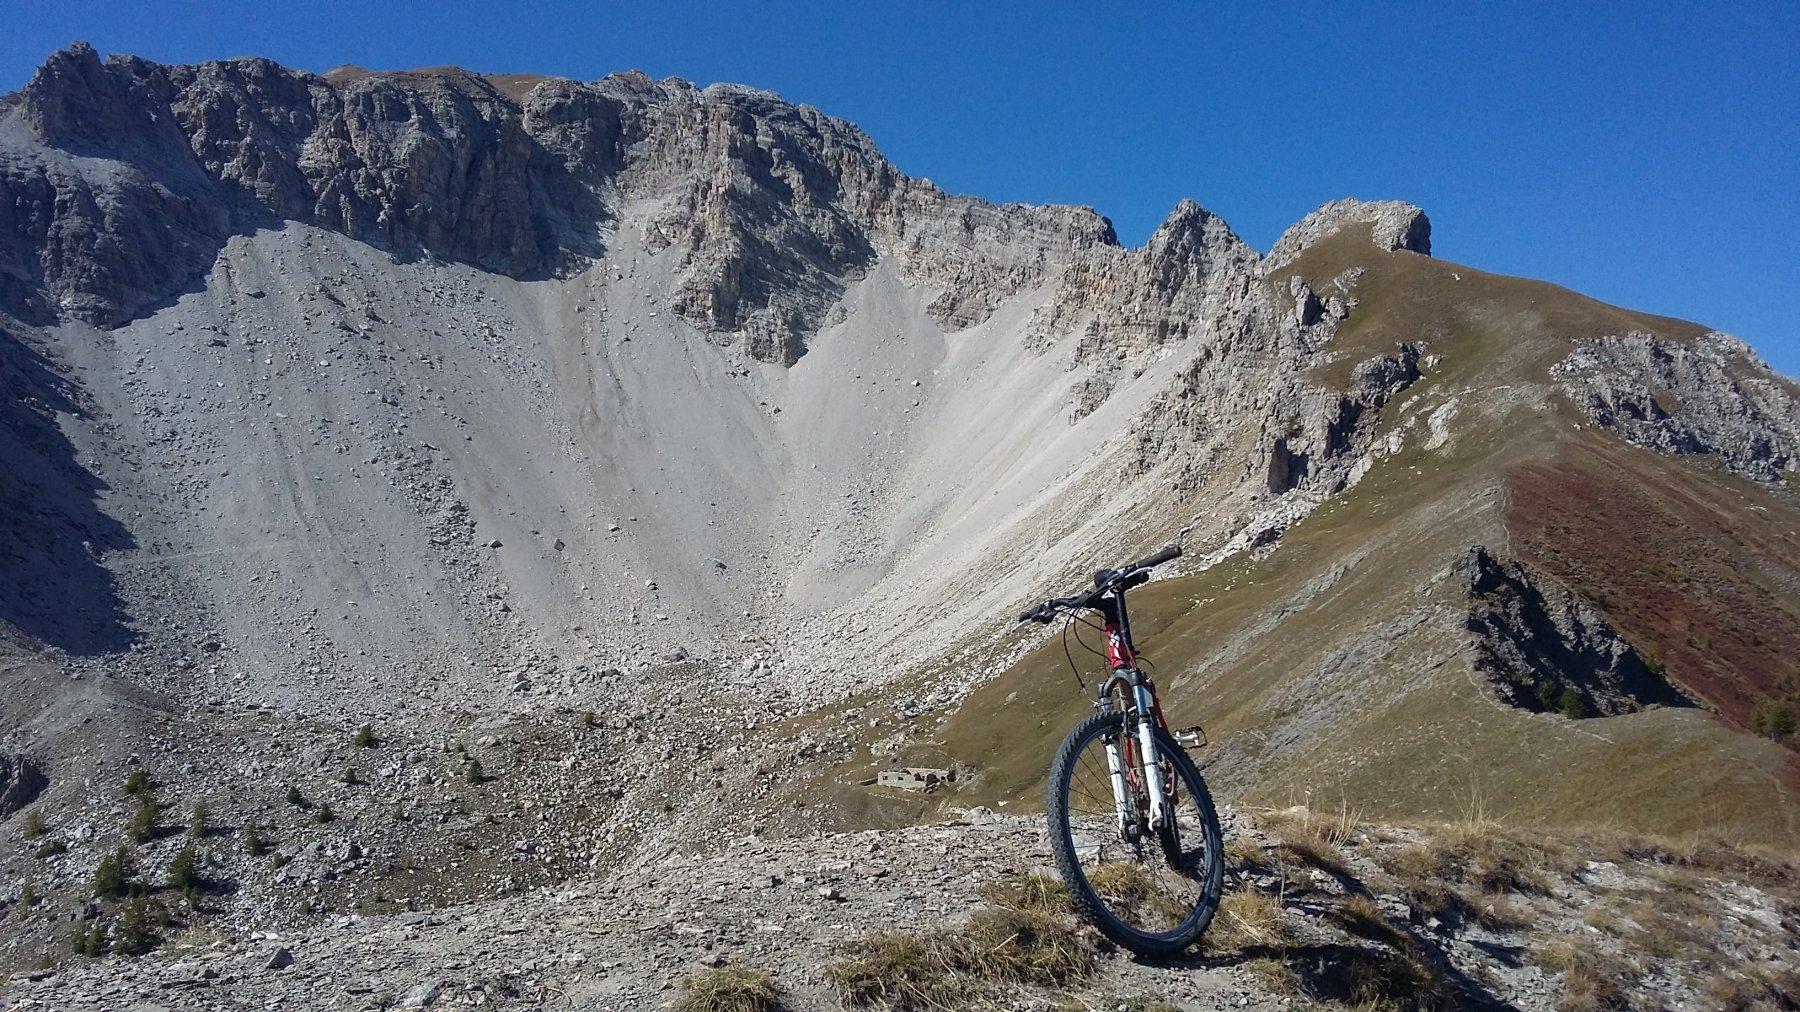 San Giuseppe (Croce) e Lago Desertes da Oulx per Madonna del Cotolivier, discesa su Desertes 2018-09-29